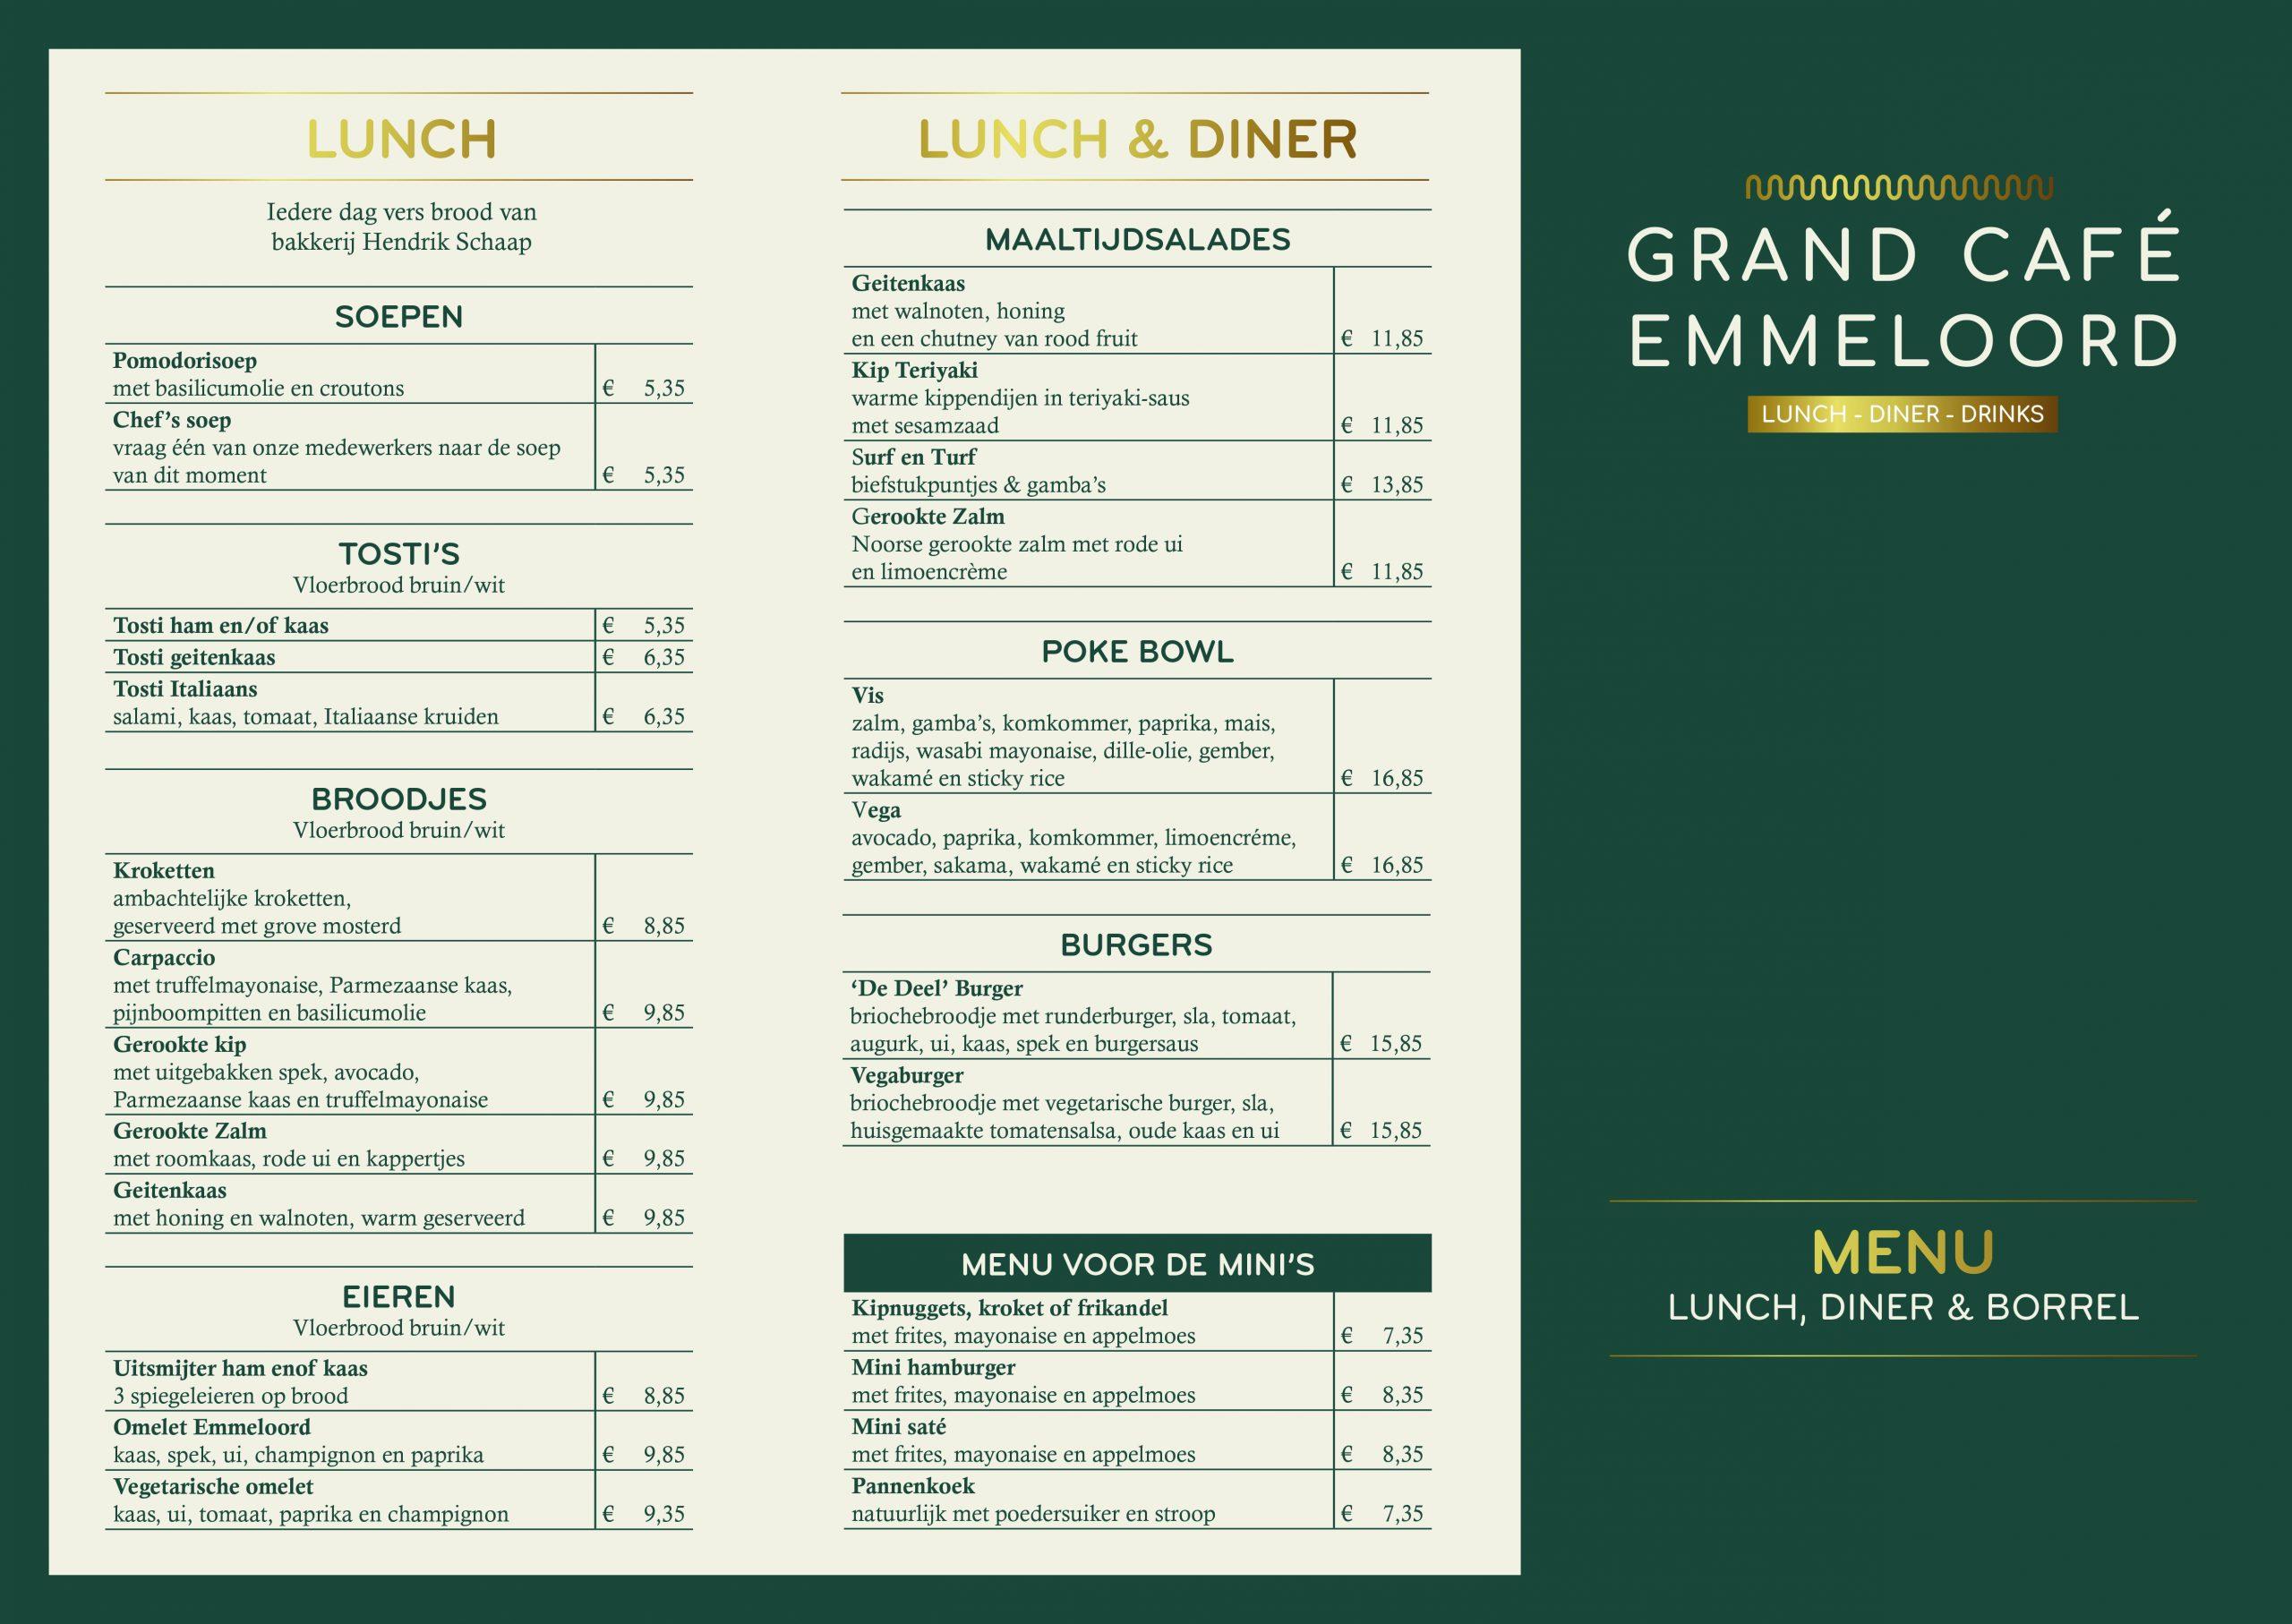 Grand Cafe emmeloord menukaart 1